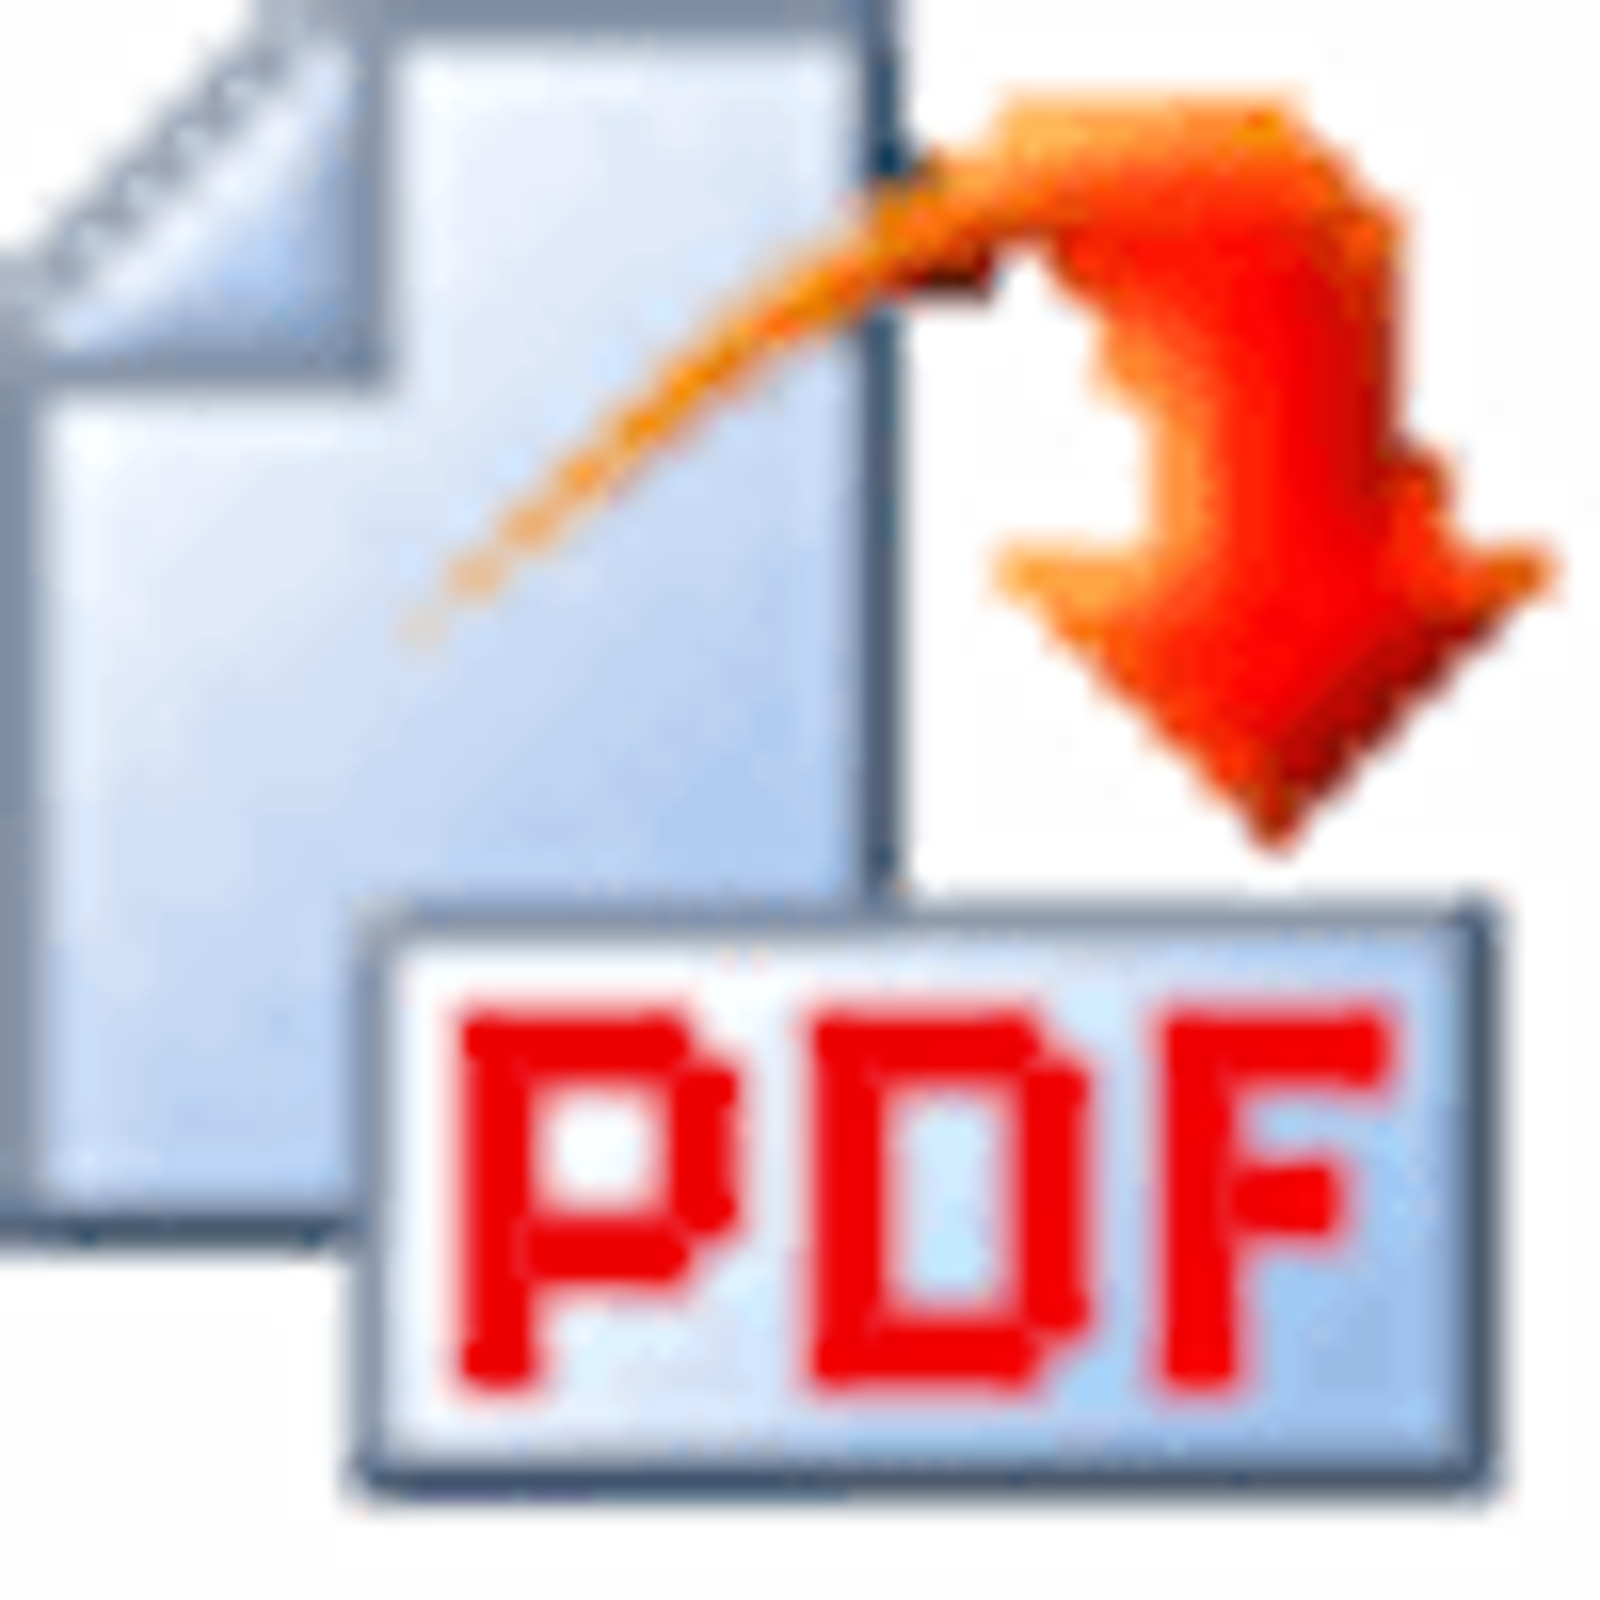 vNew PDF To Image Converter